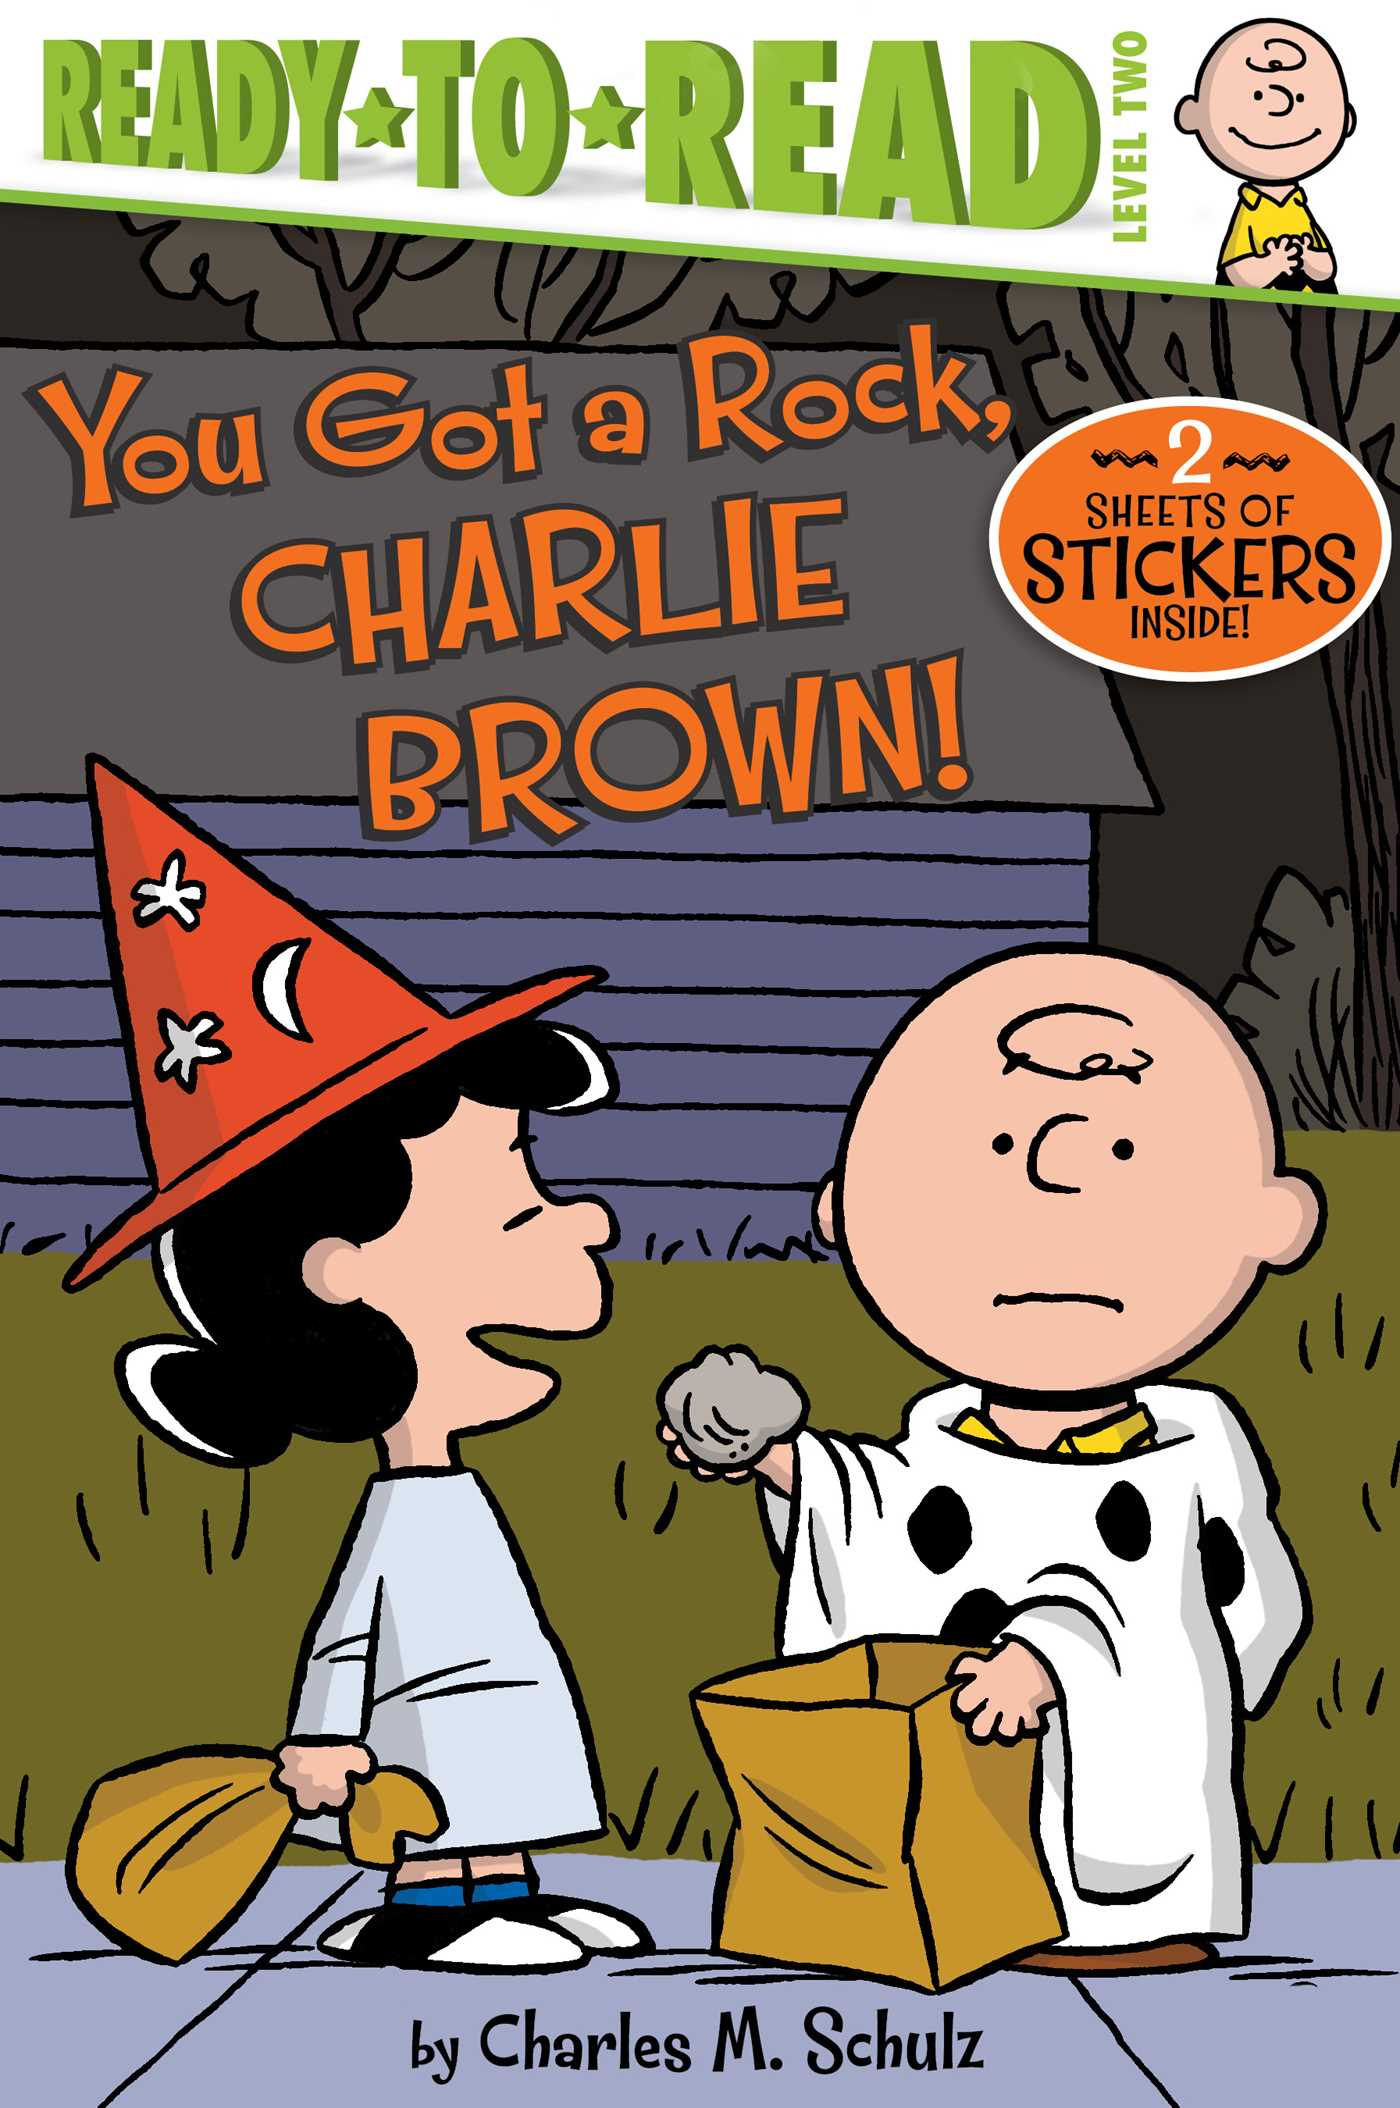 You got a rock charlie brown 9781534405011 hr